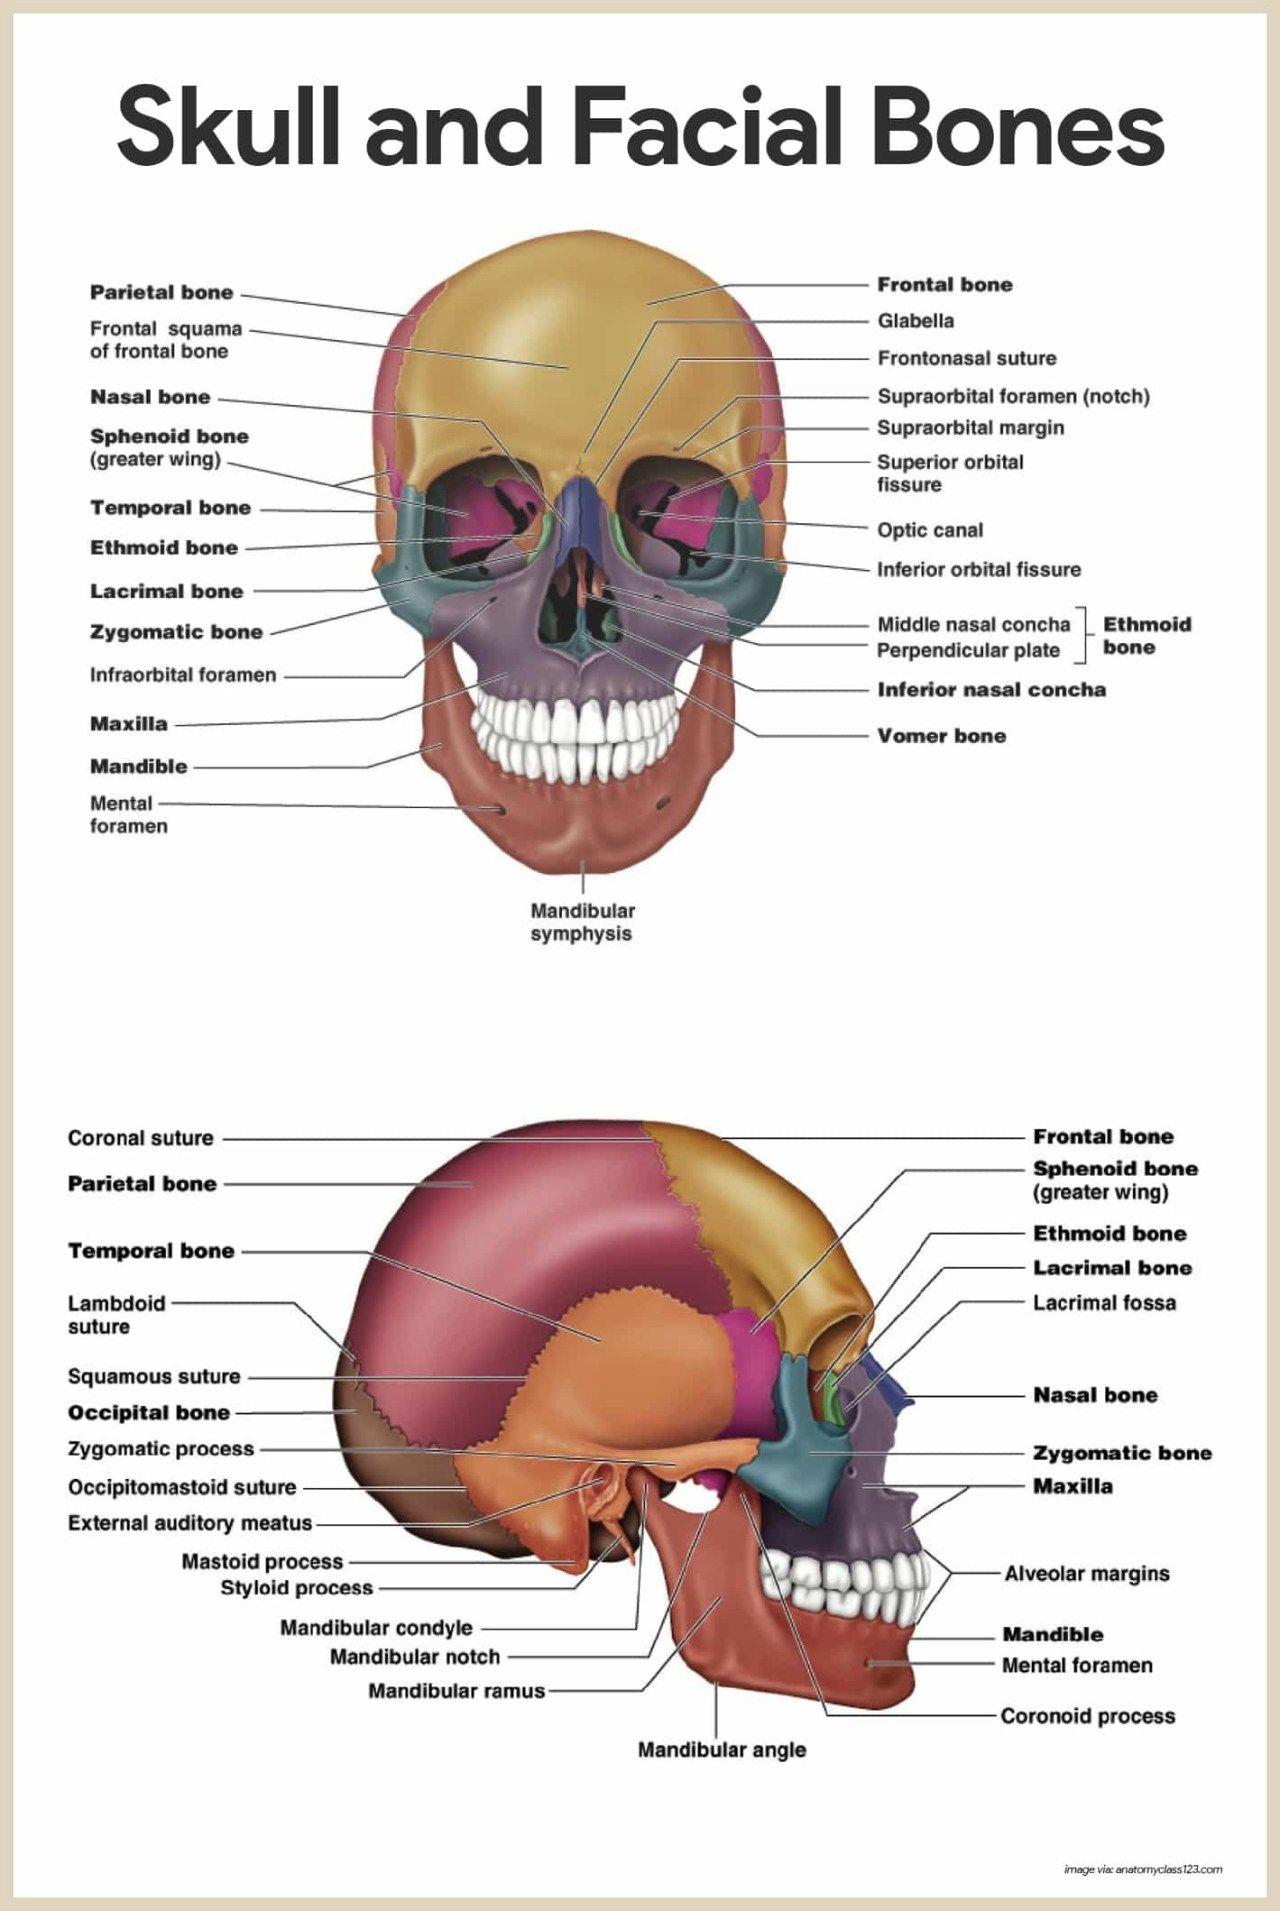 hight resolution of anatomy bones learning skeletal system anatomy and physiology nurseslabs